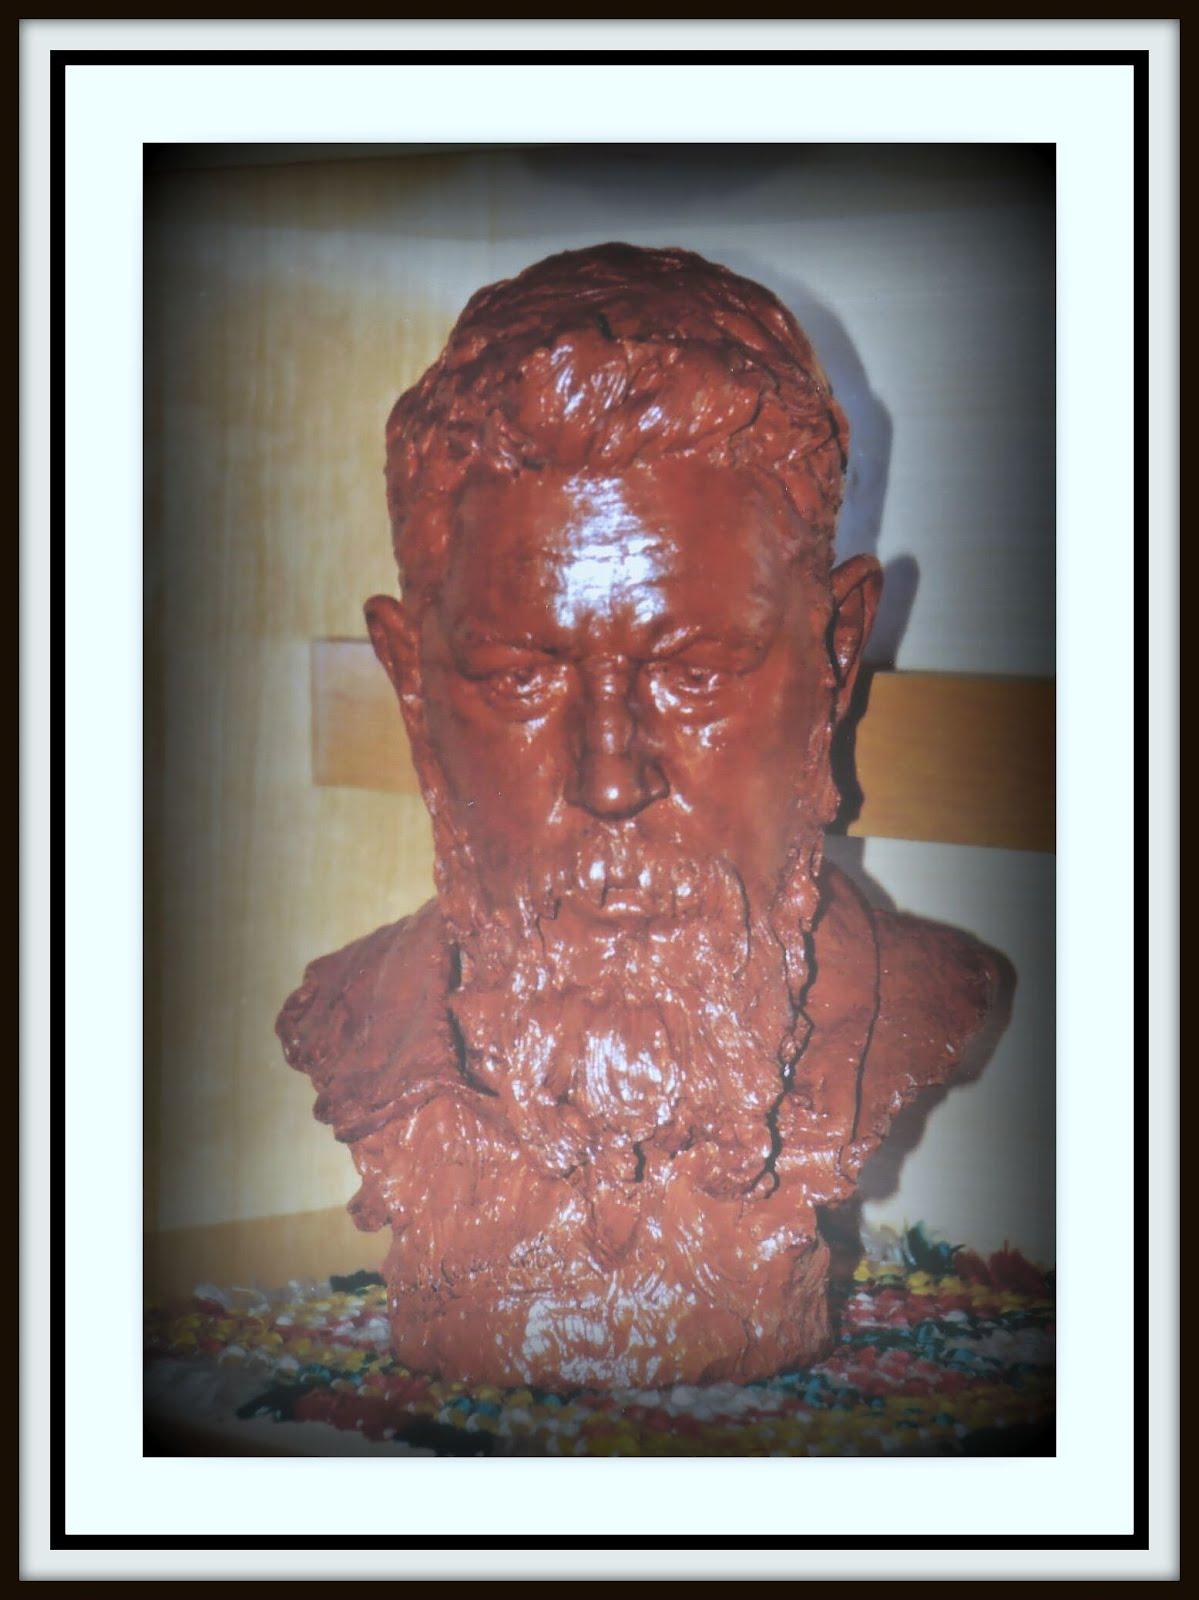 Escultor Y Pintor Ricardo Causar S Casa A 12_12 # Muebles Peiro Quart De Poblet